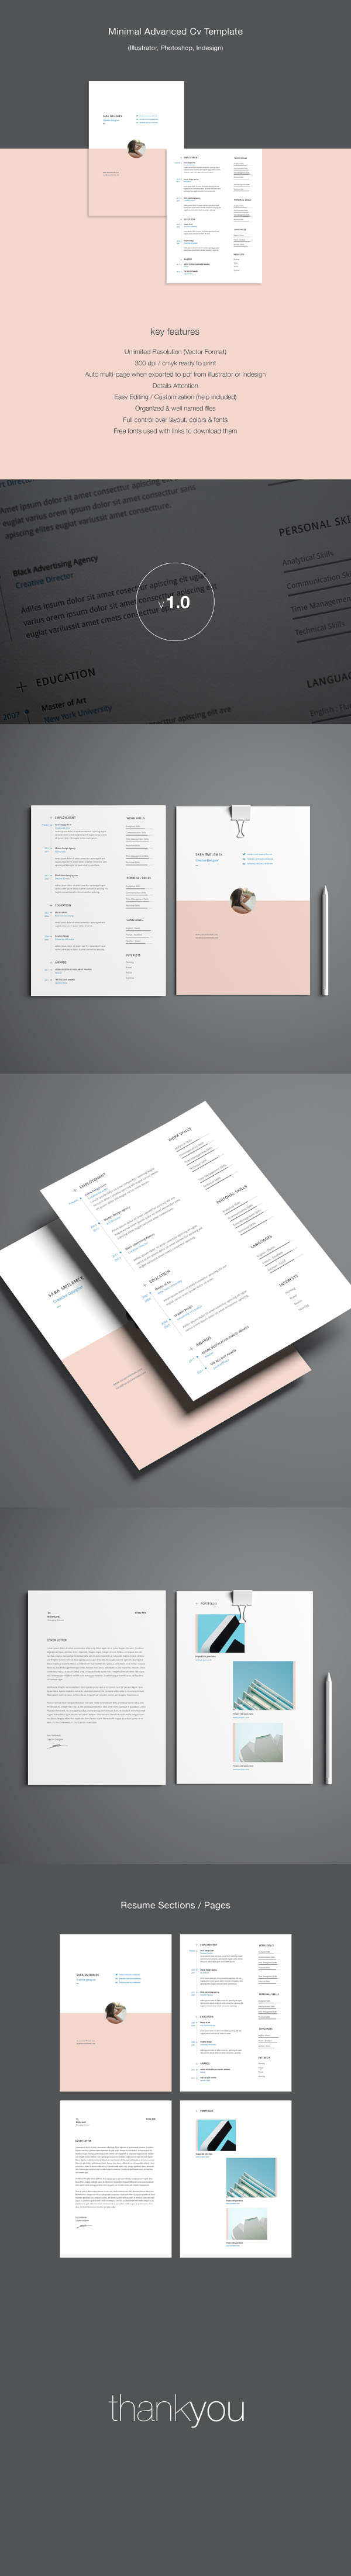 Minimal Multi Page Resume Template